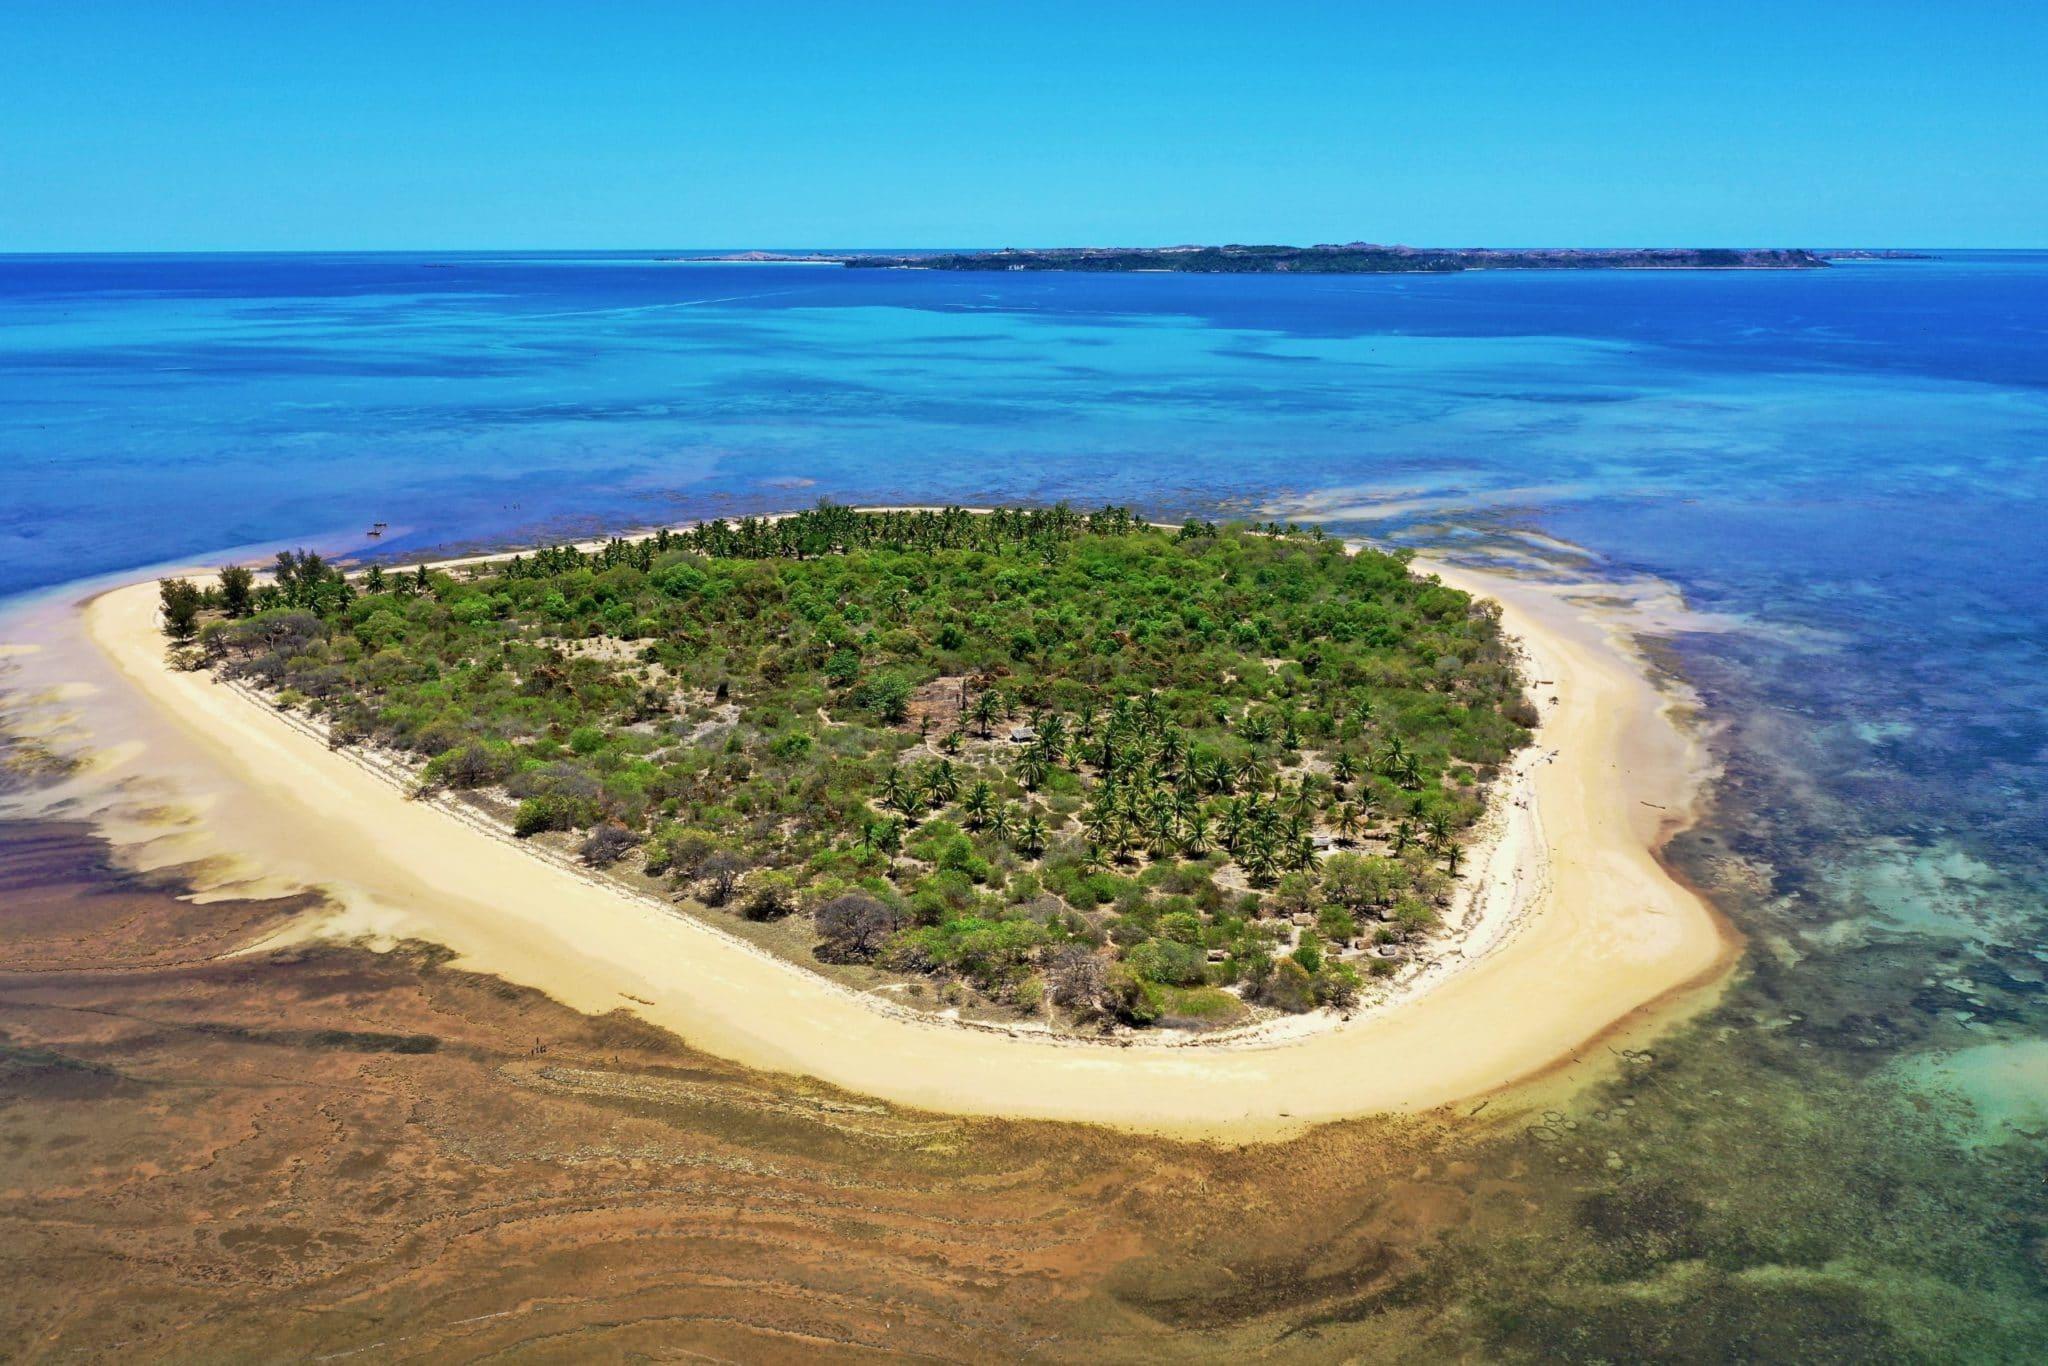 îles radama